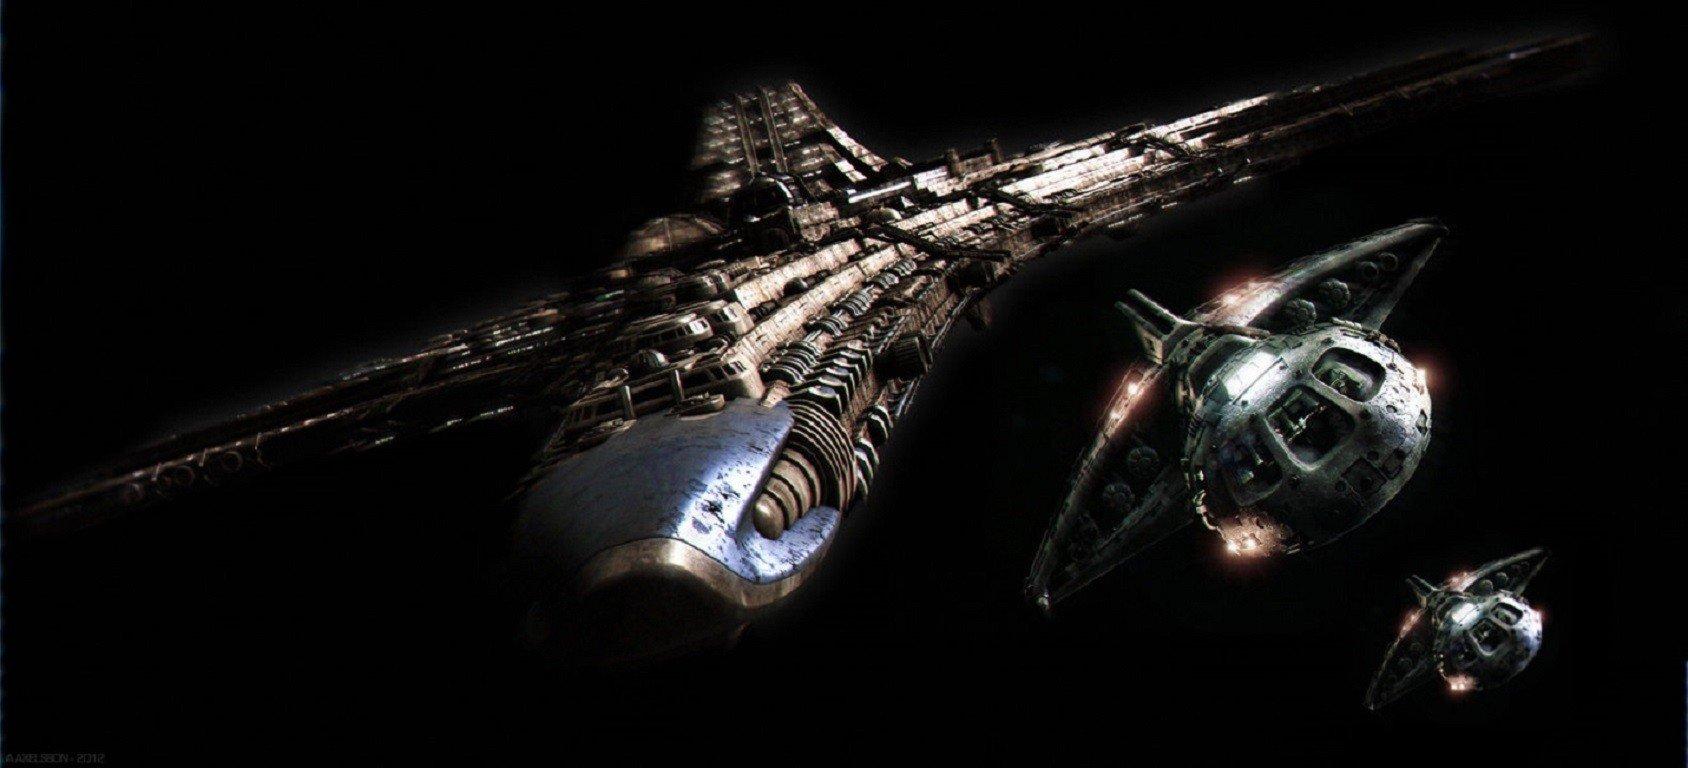 Stargate destiny spaceship destiny shuttle space hd - Spaceship wallpaper ...